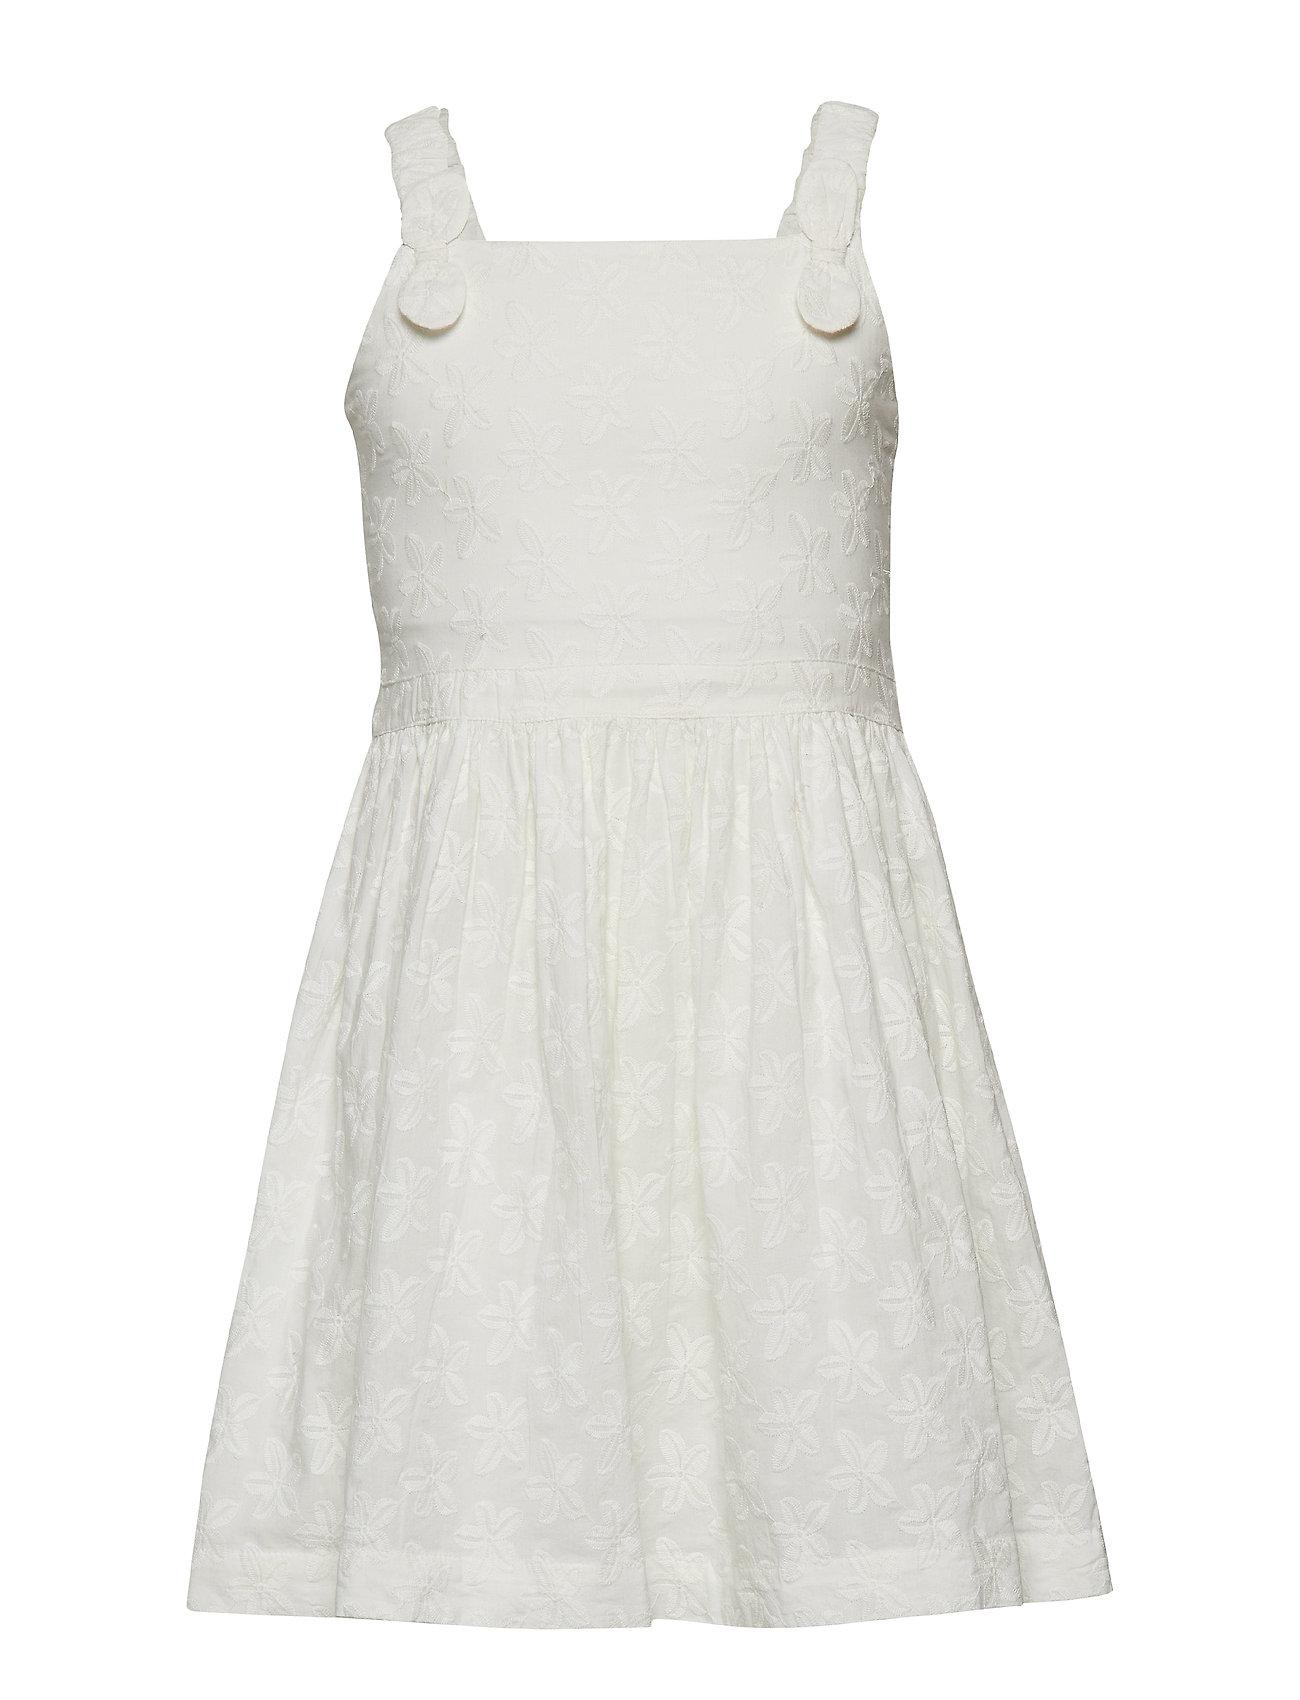 Polarn O. Pyret Dress Embroidery School - SNOW WHITE